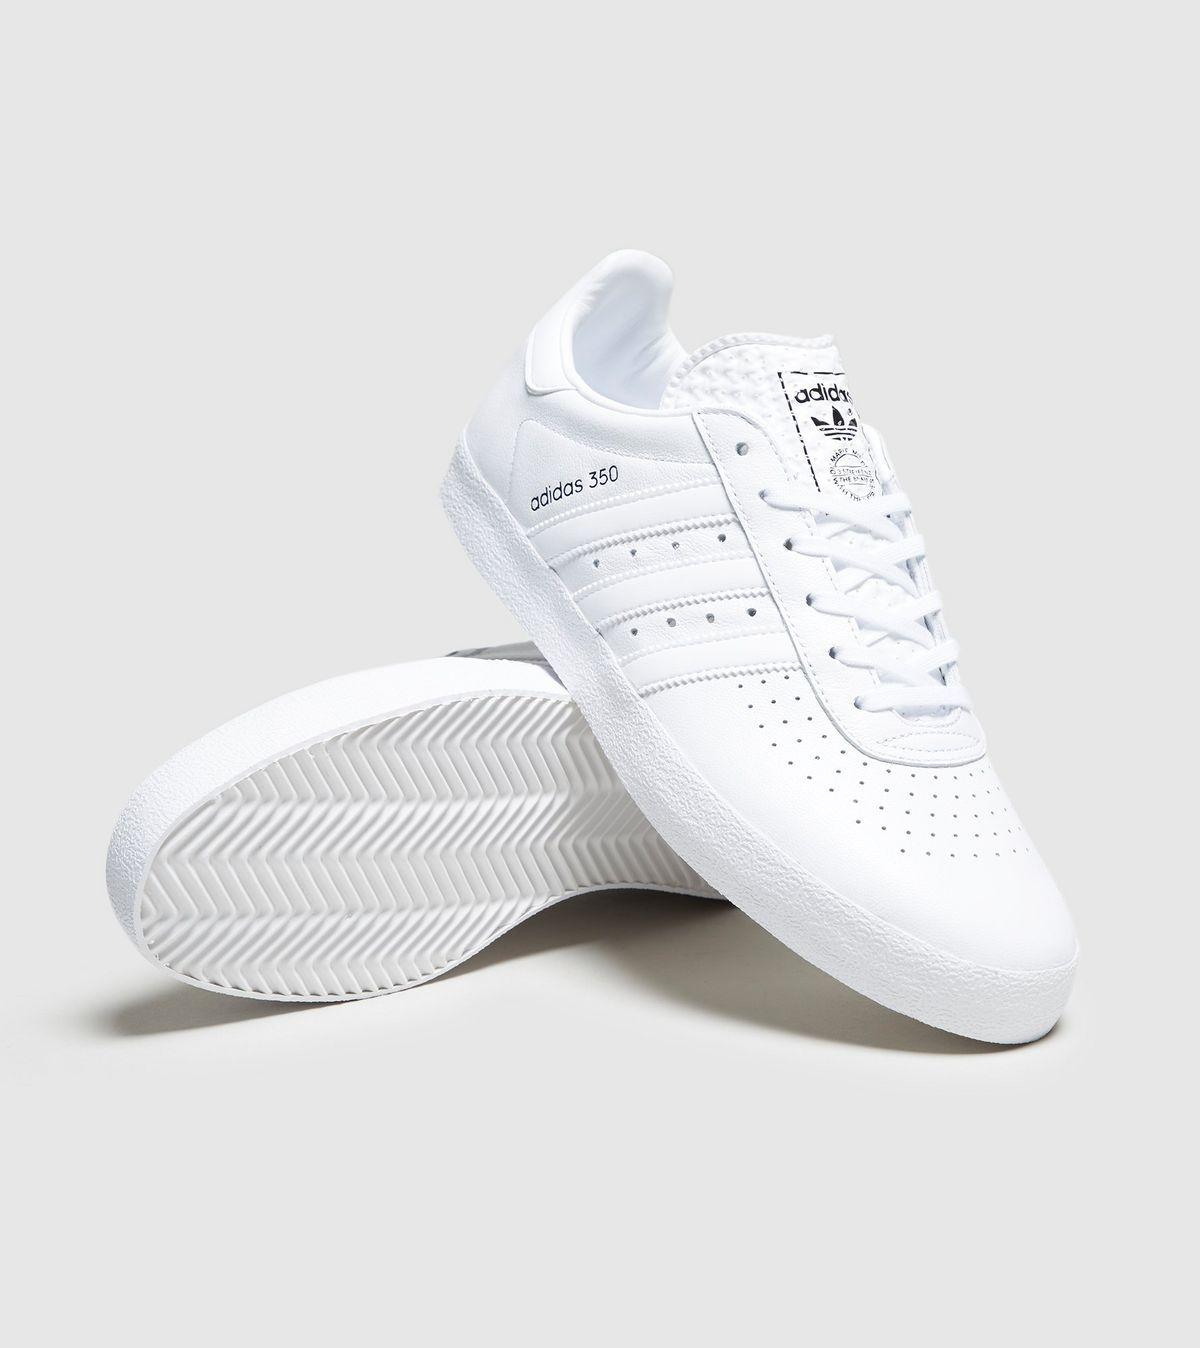 adidas sneakers 350